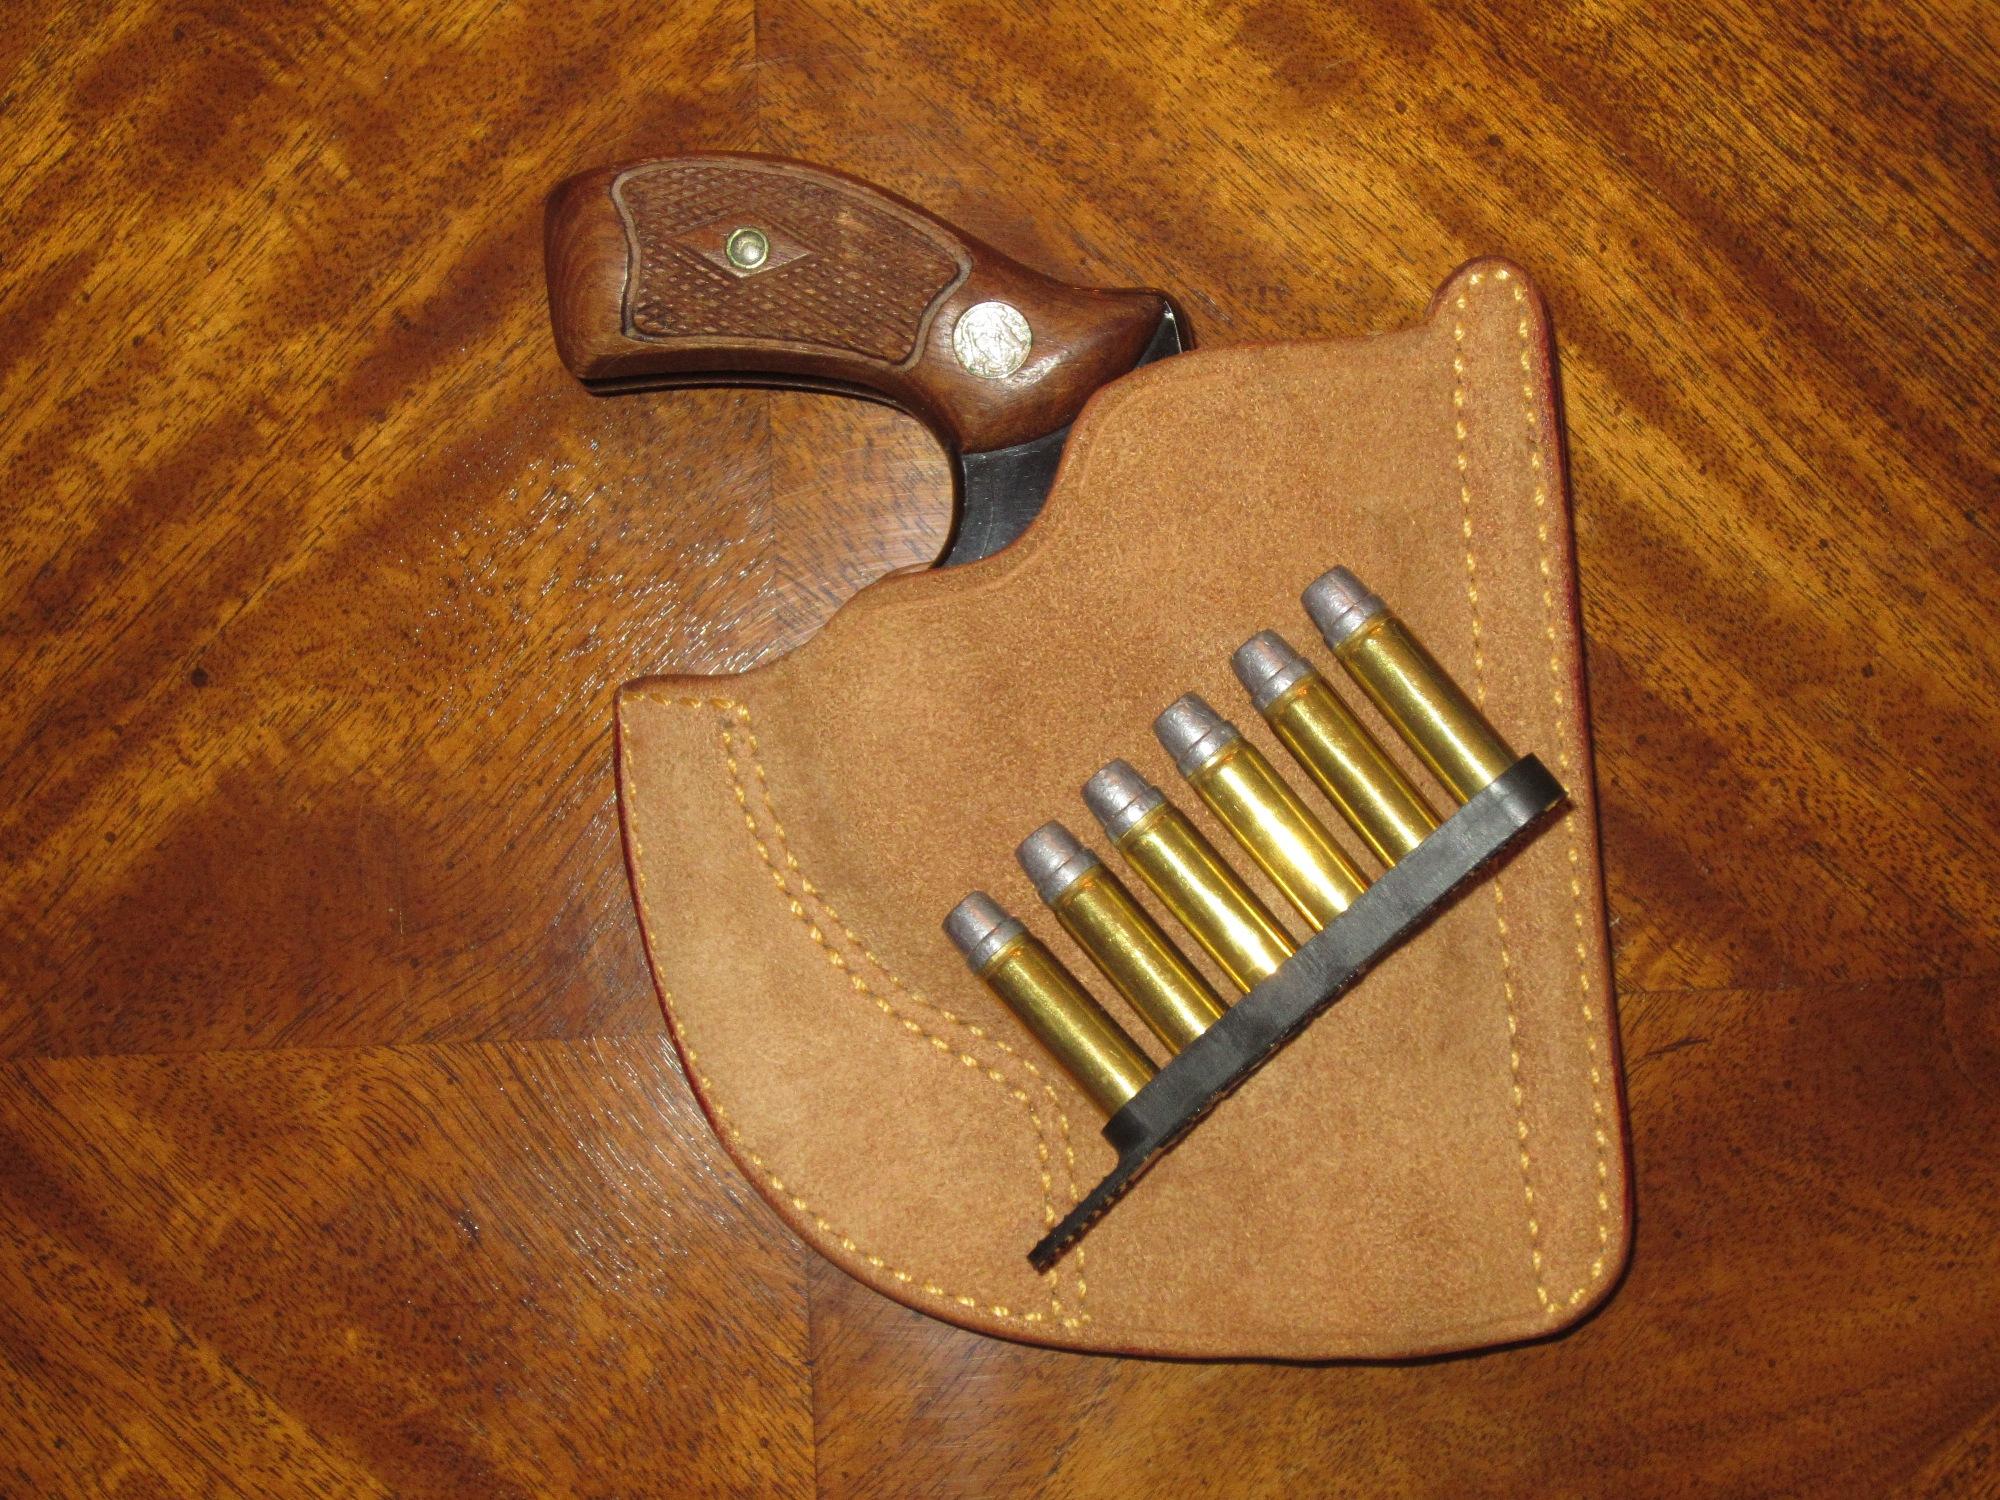 What's your favorite J-frame pocket holster?